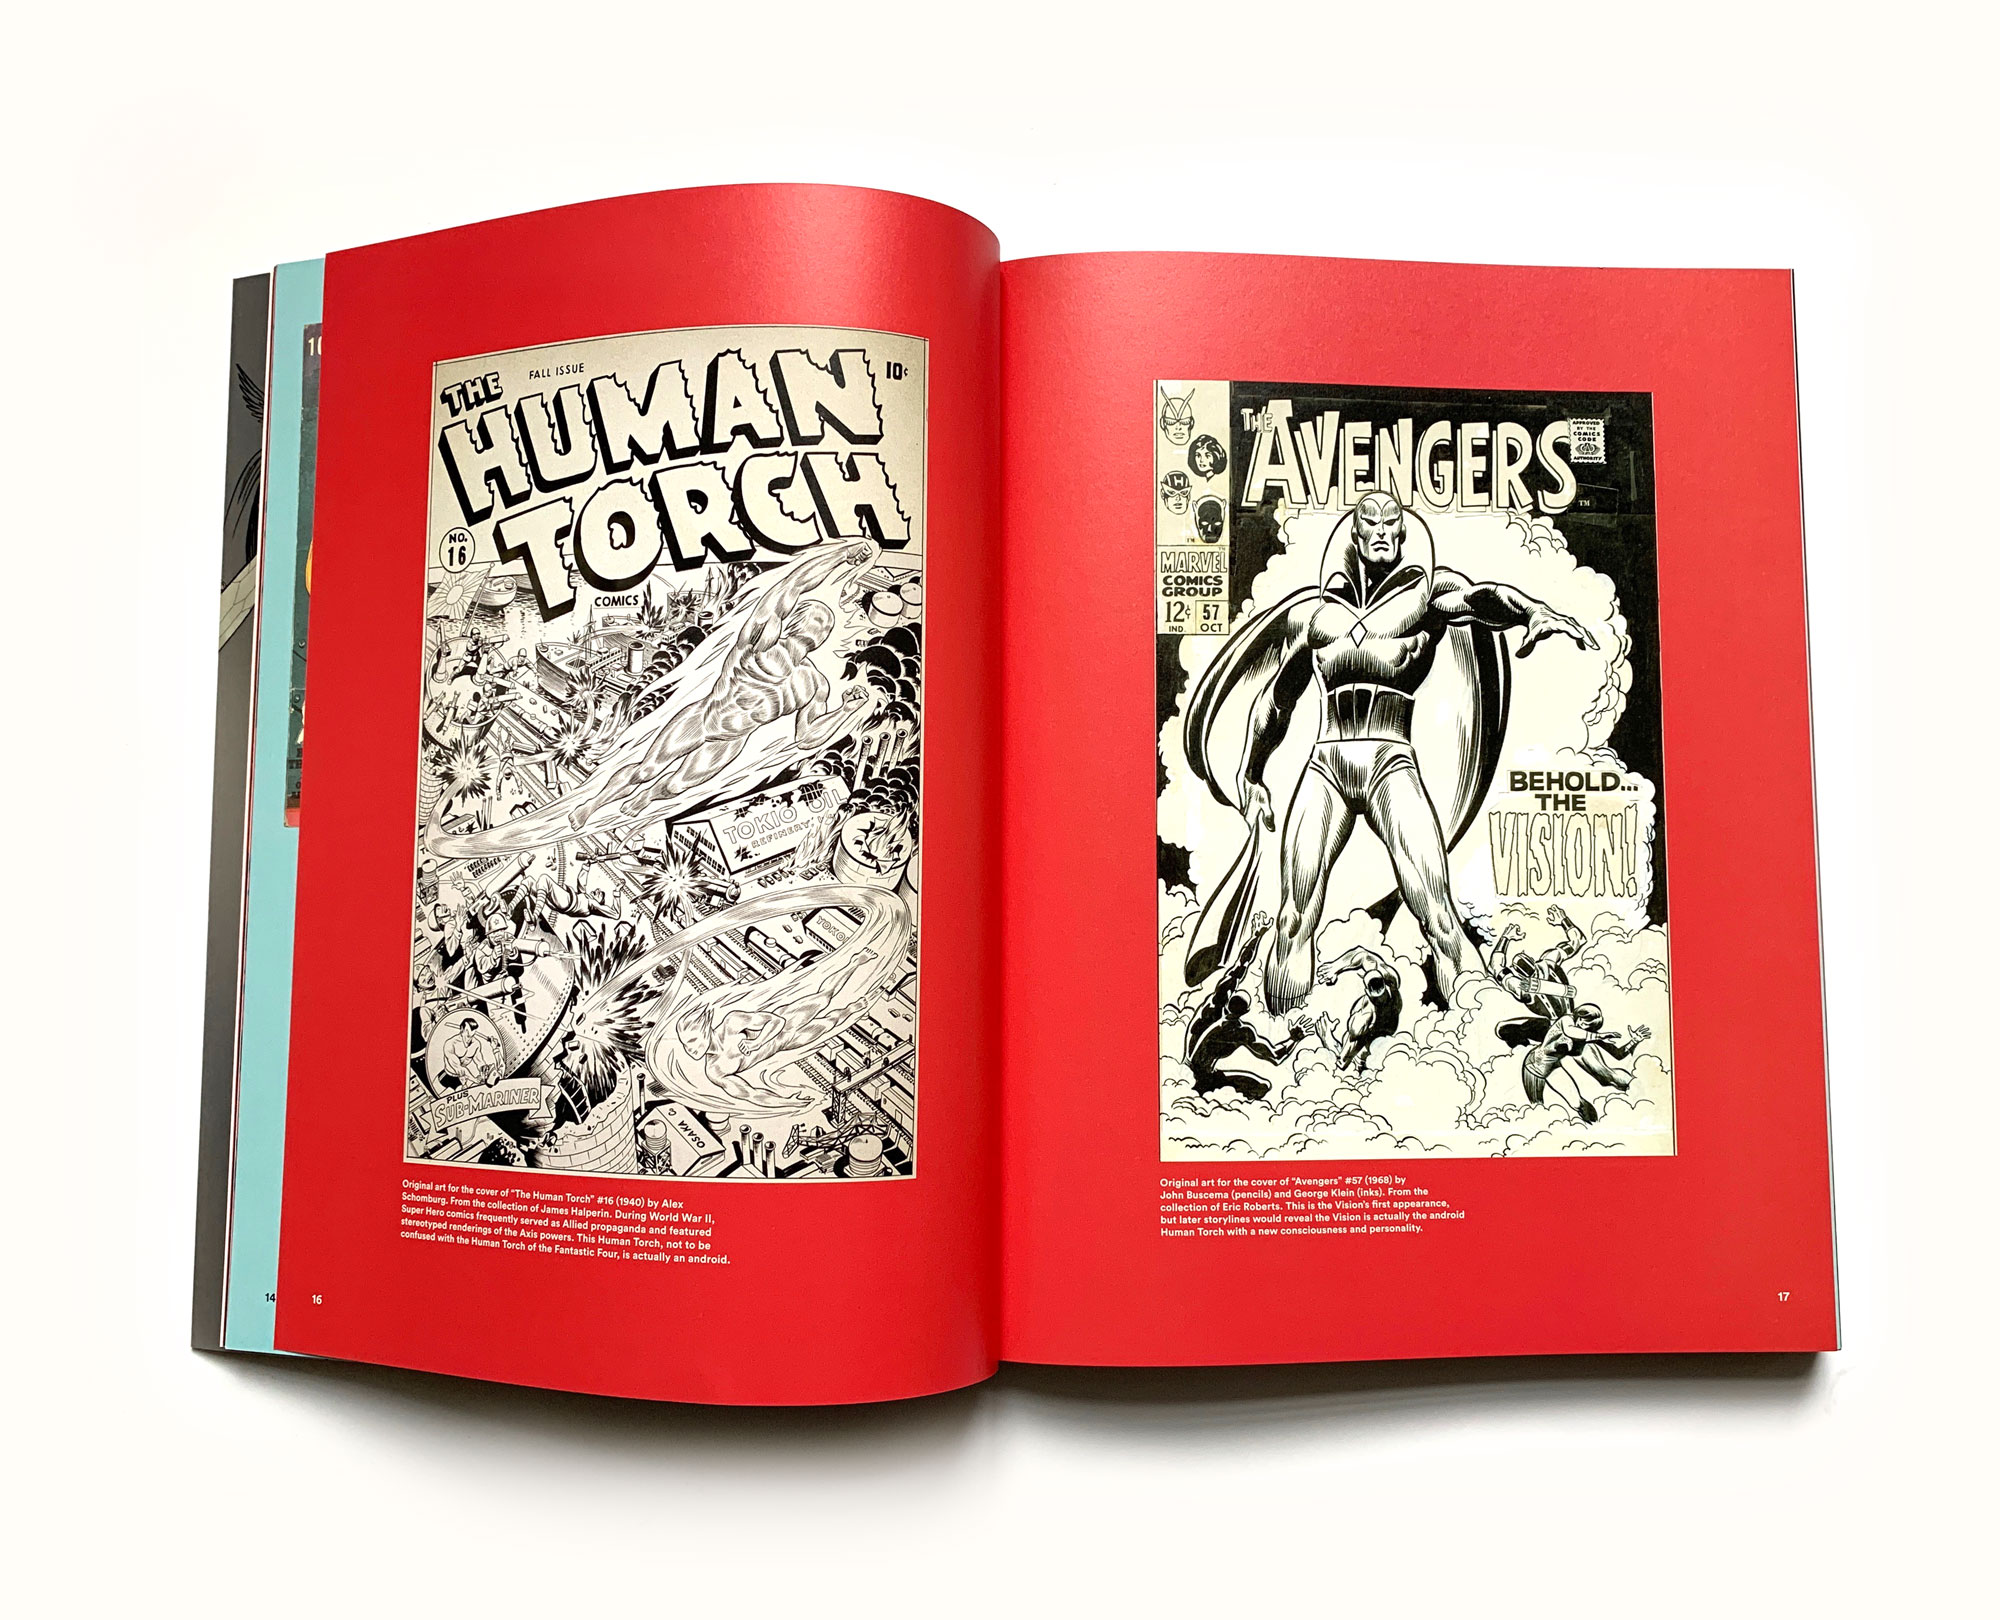 Marvel-Universe-of-Super-Heroes-Book-Avengers-Balgavy.jpg